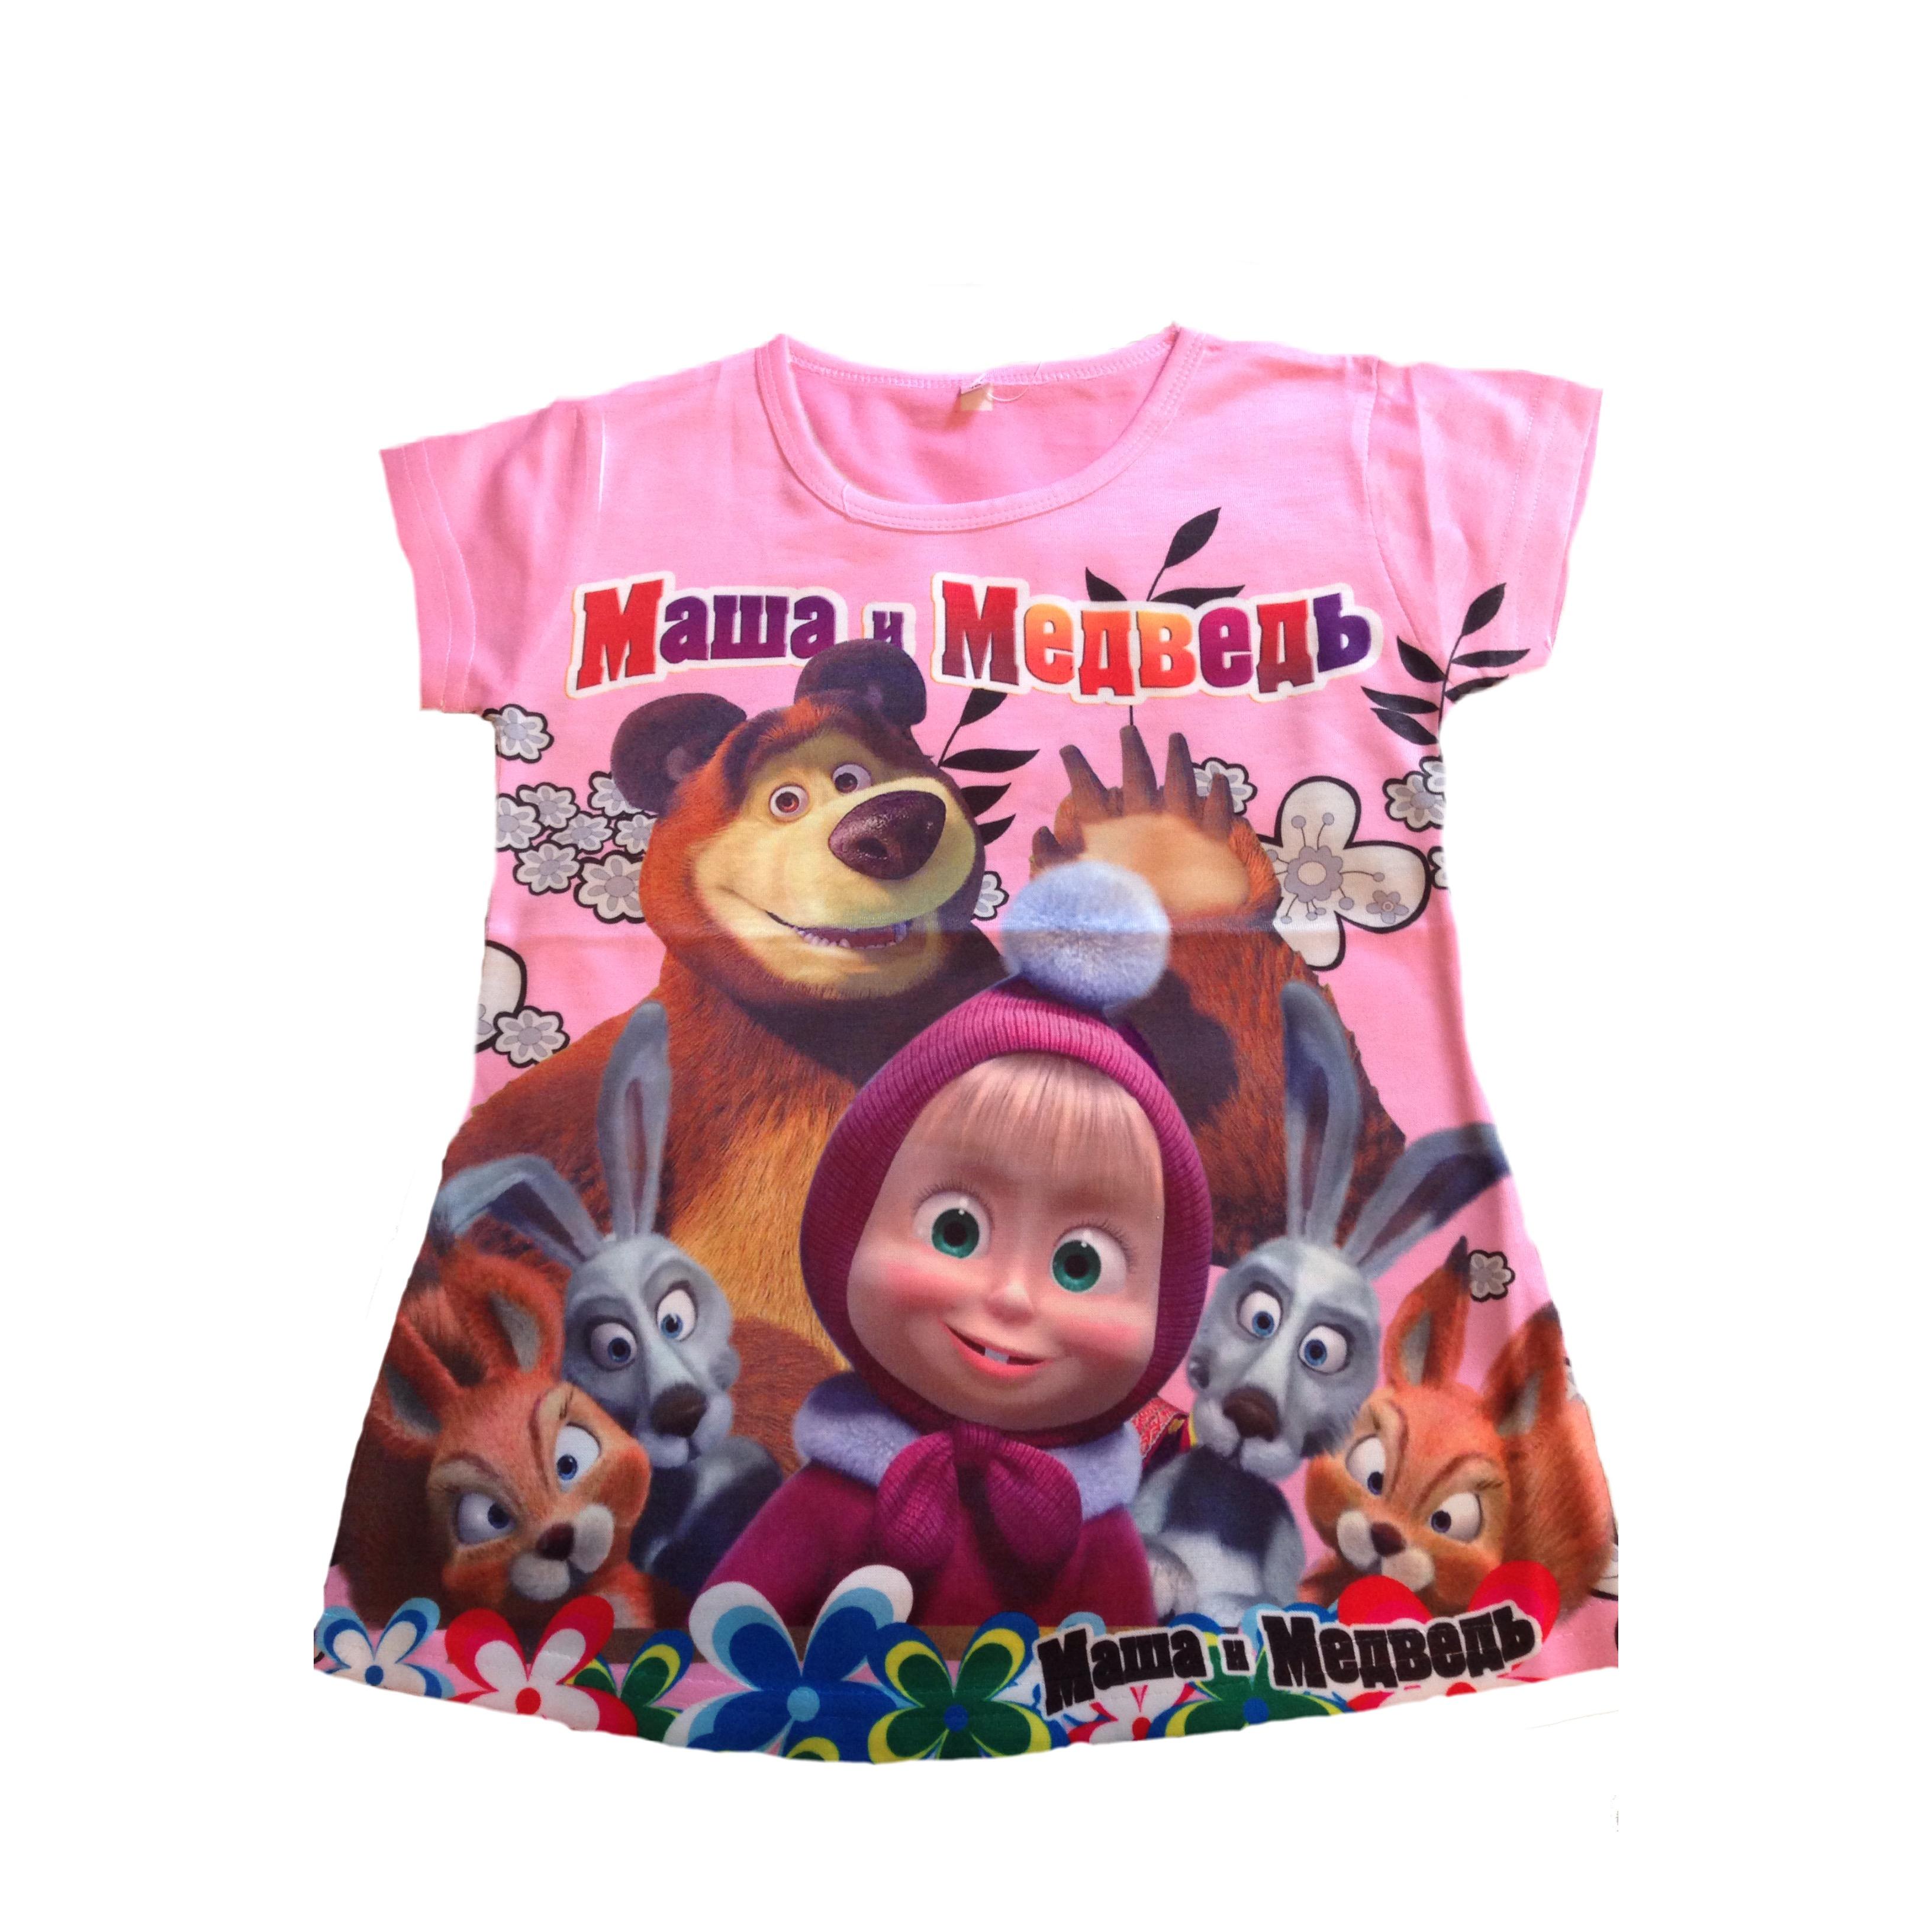 Masha and the Bear T Shirt